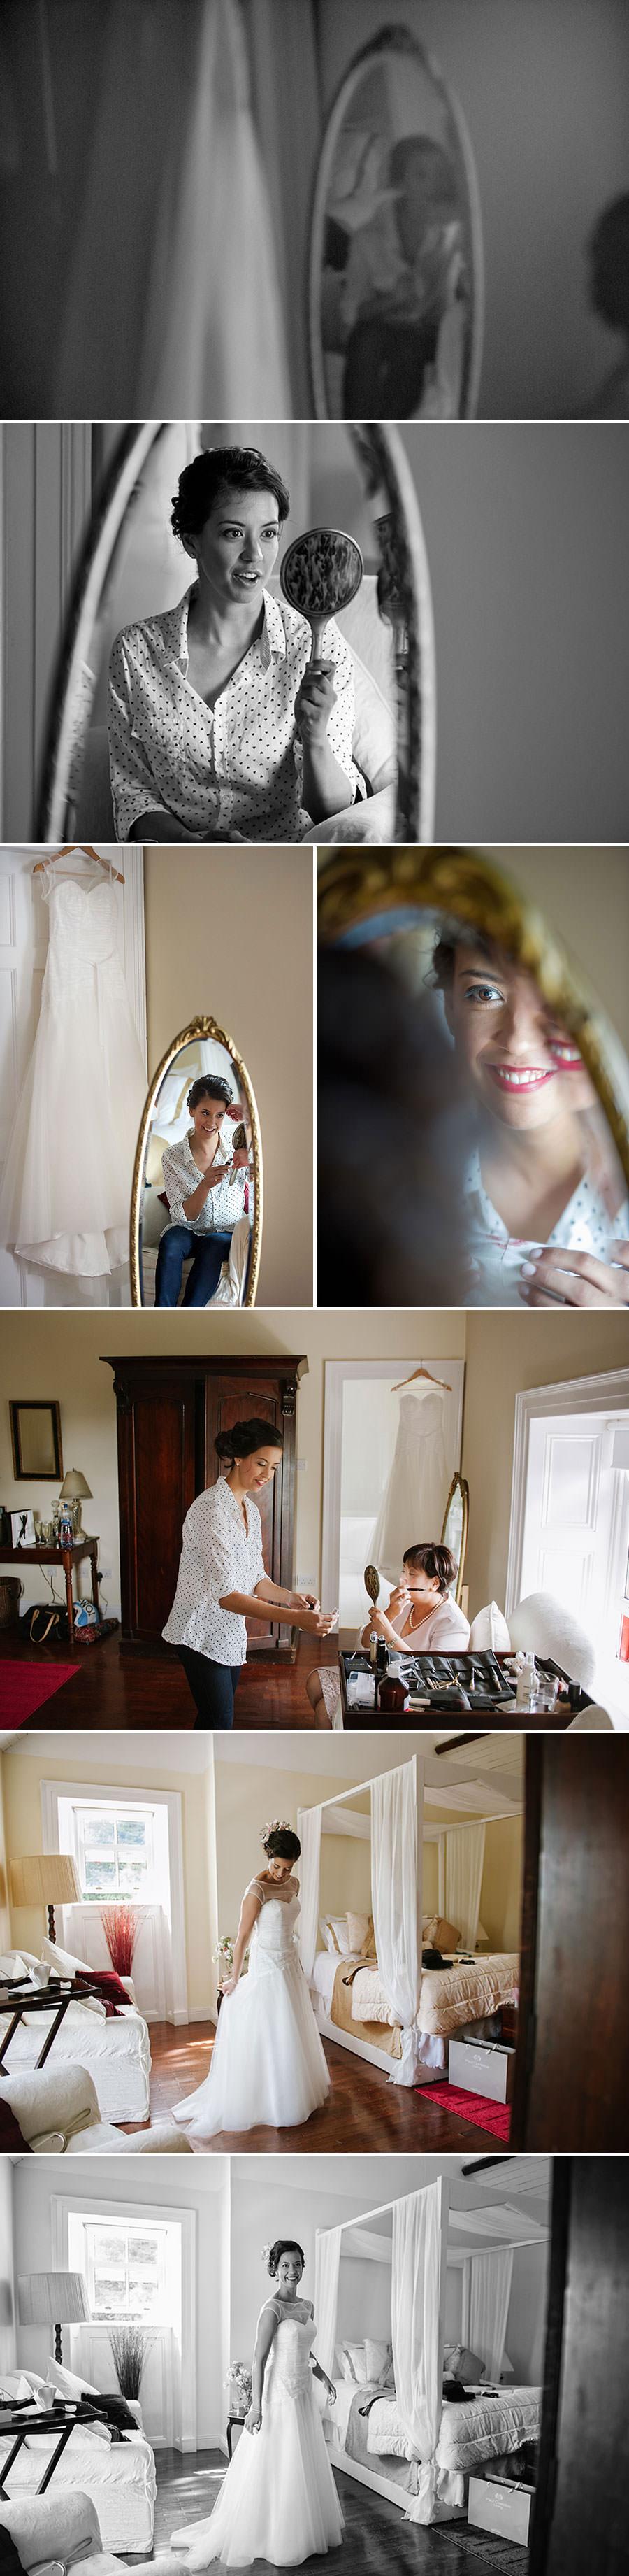 P + R | Barnabrow Country House Wedding | Irish - Australian Wedding | Cork Wedding Photography 3